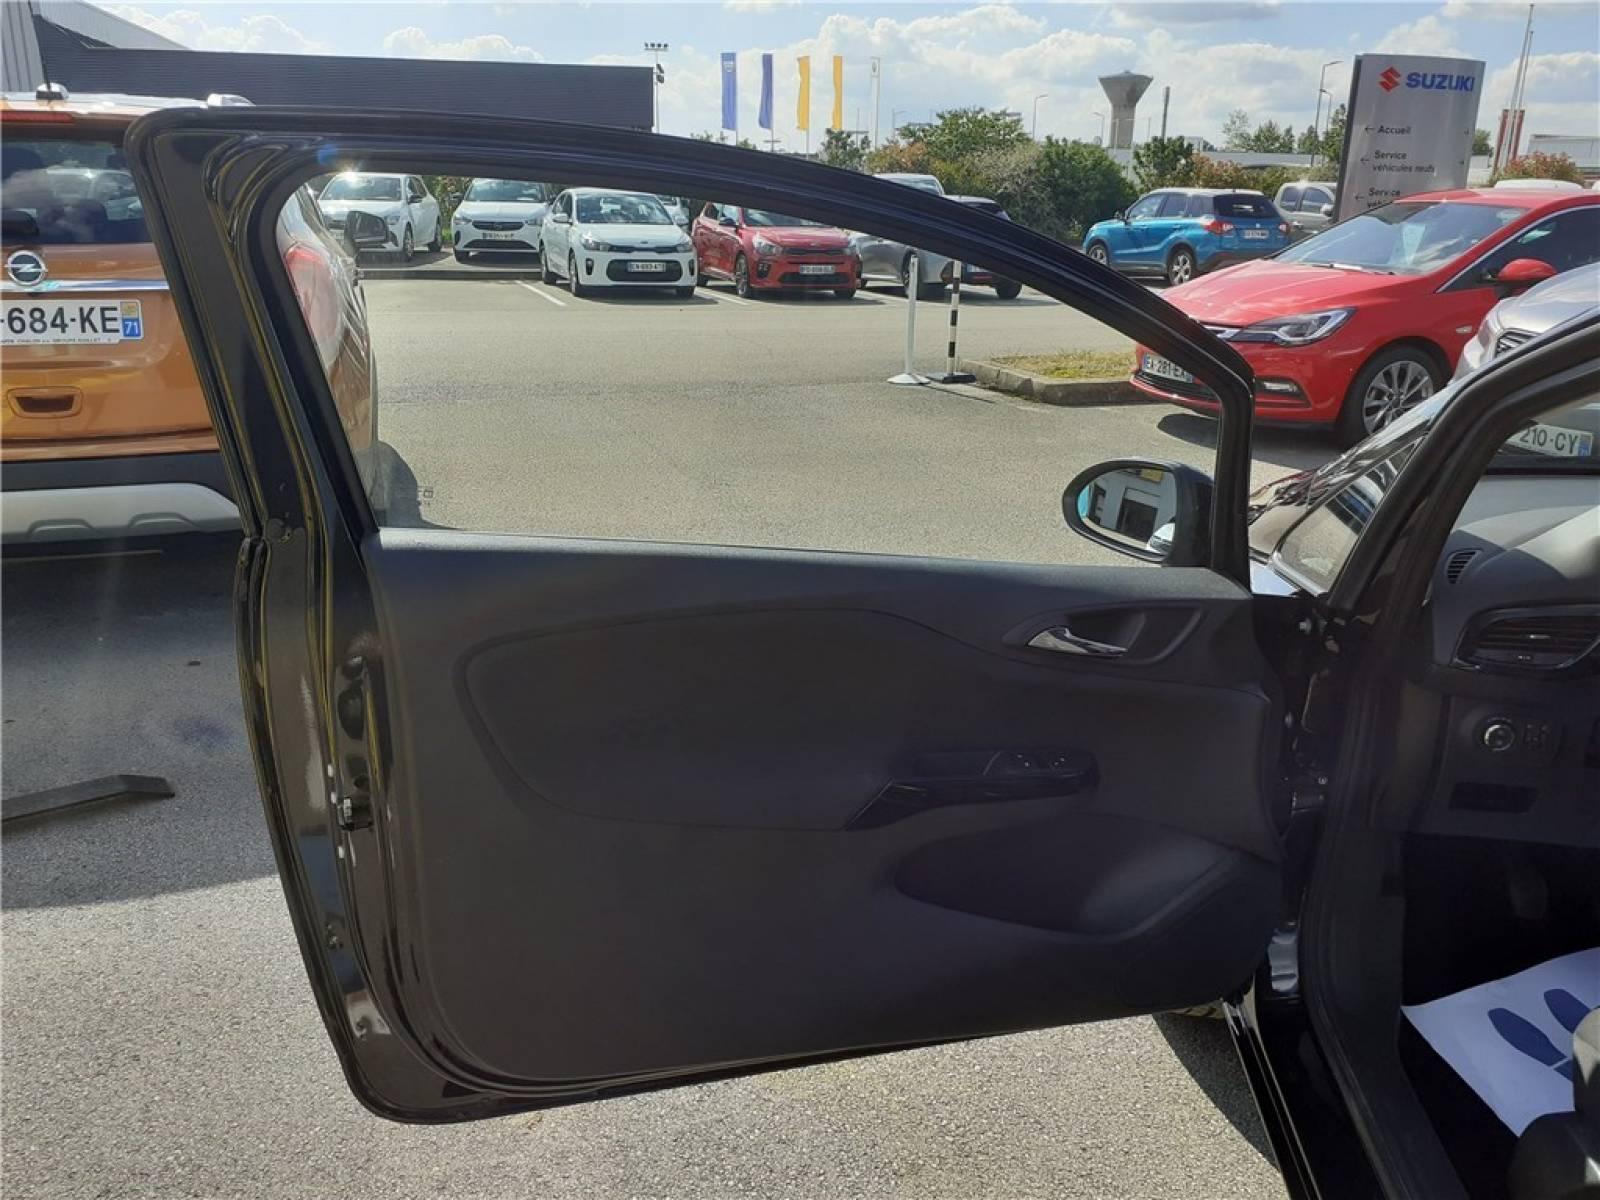 OPEL Corsa 1.4 Turbo 100 ch - véhicule d'occasion - Groupe Guillet - Opel Magicauto - Chalon-sur-Saône - 71380 - Saint-Marcel - 14